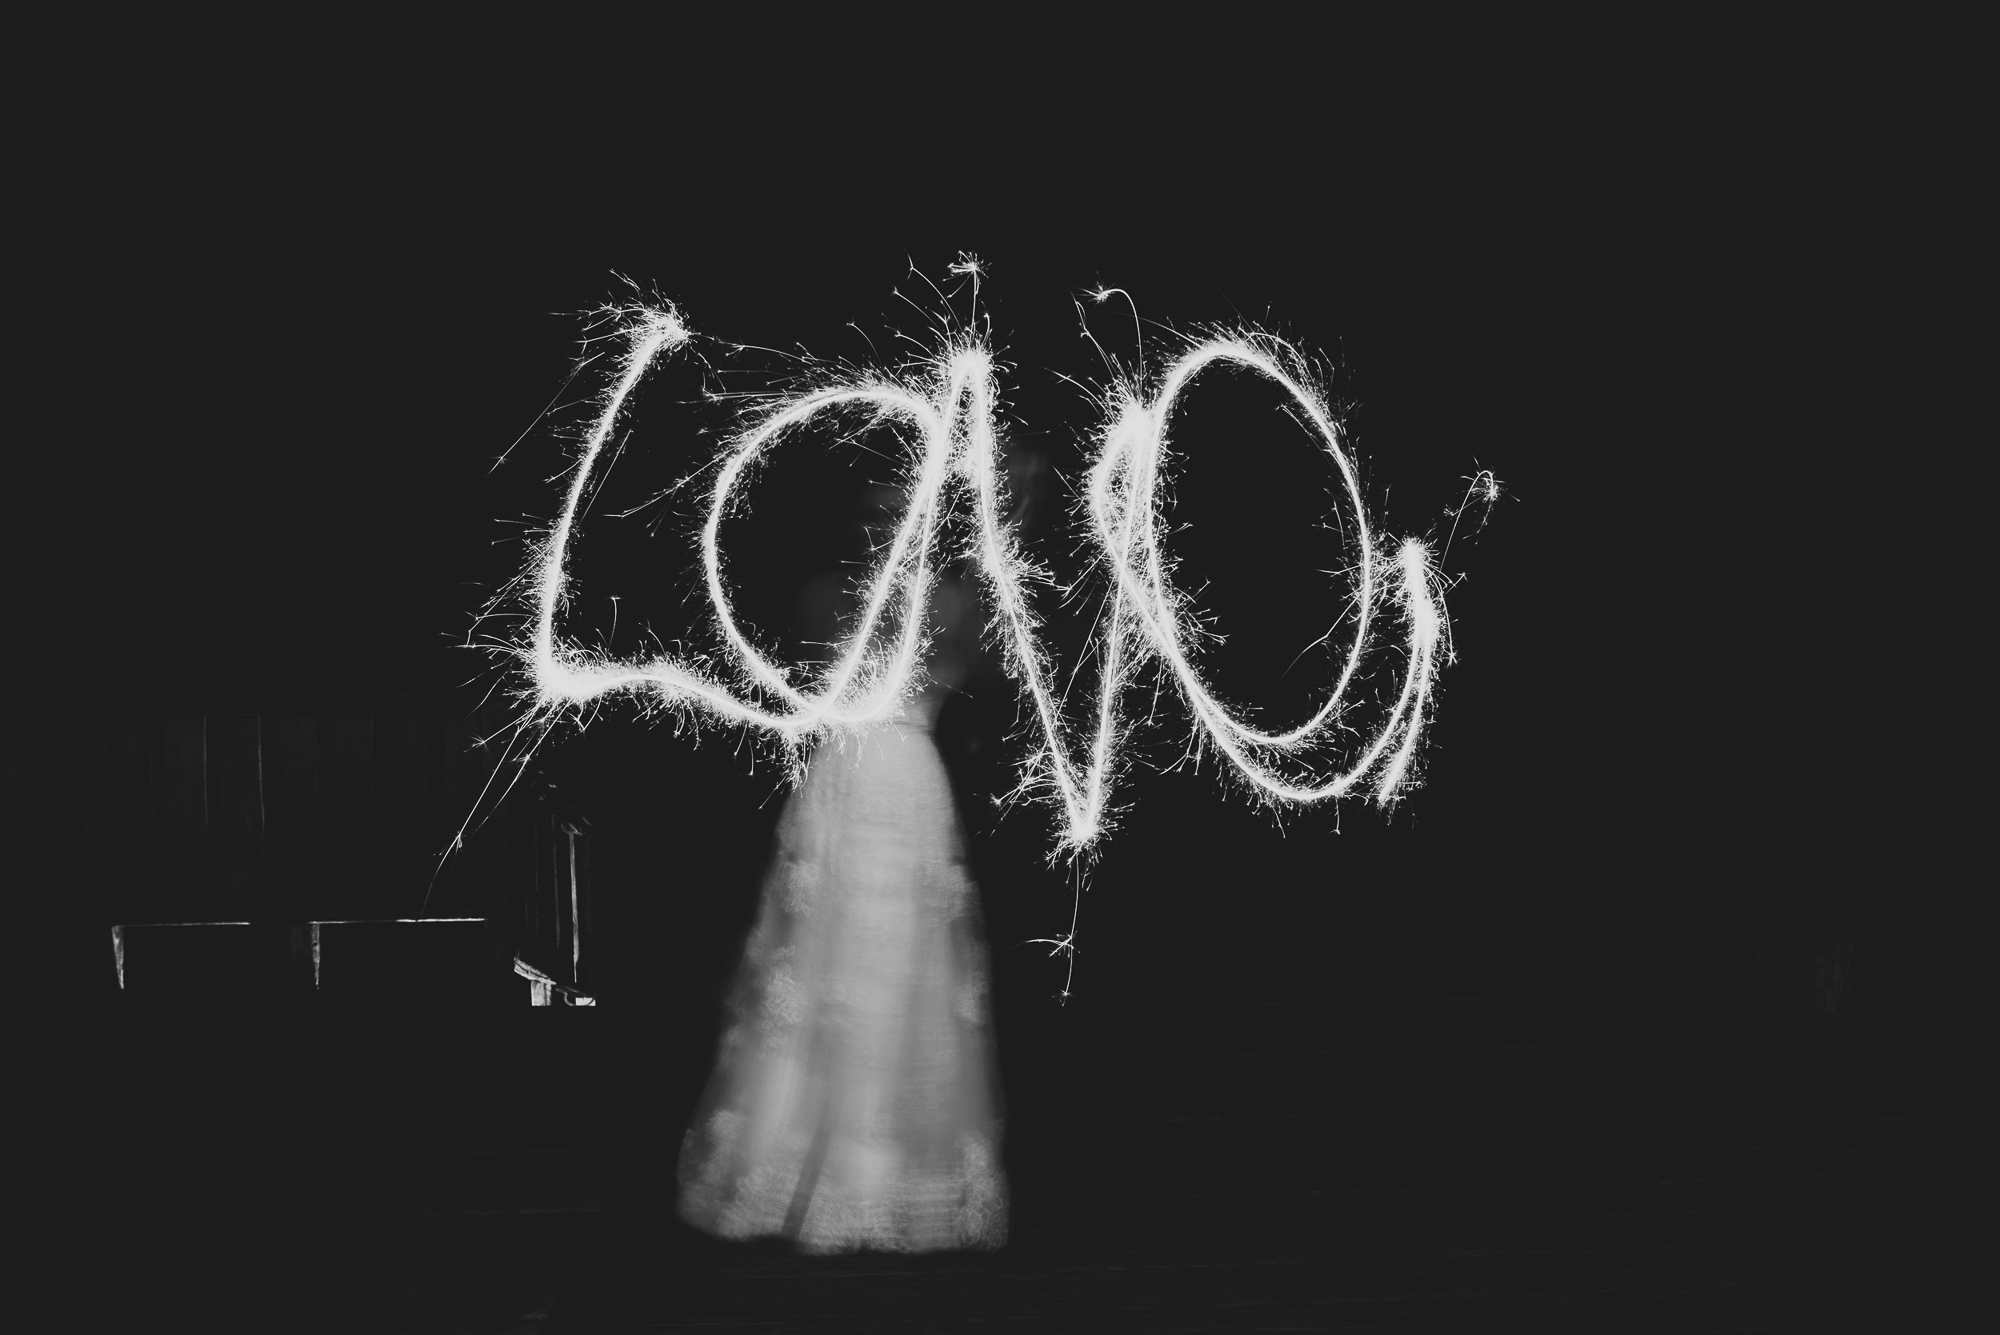 138elopement-photographer-colorado-telluride_wedding_photographer_colorado_mountain_wedding_photographer_brie&tyler_3430_vintage_black_and_white_film.jpg